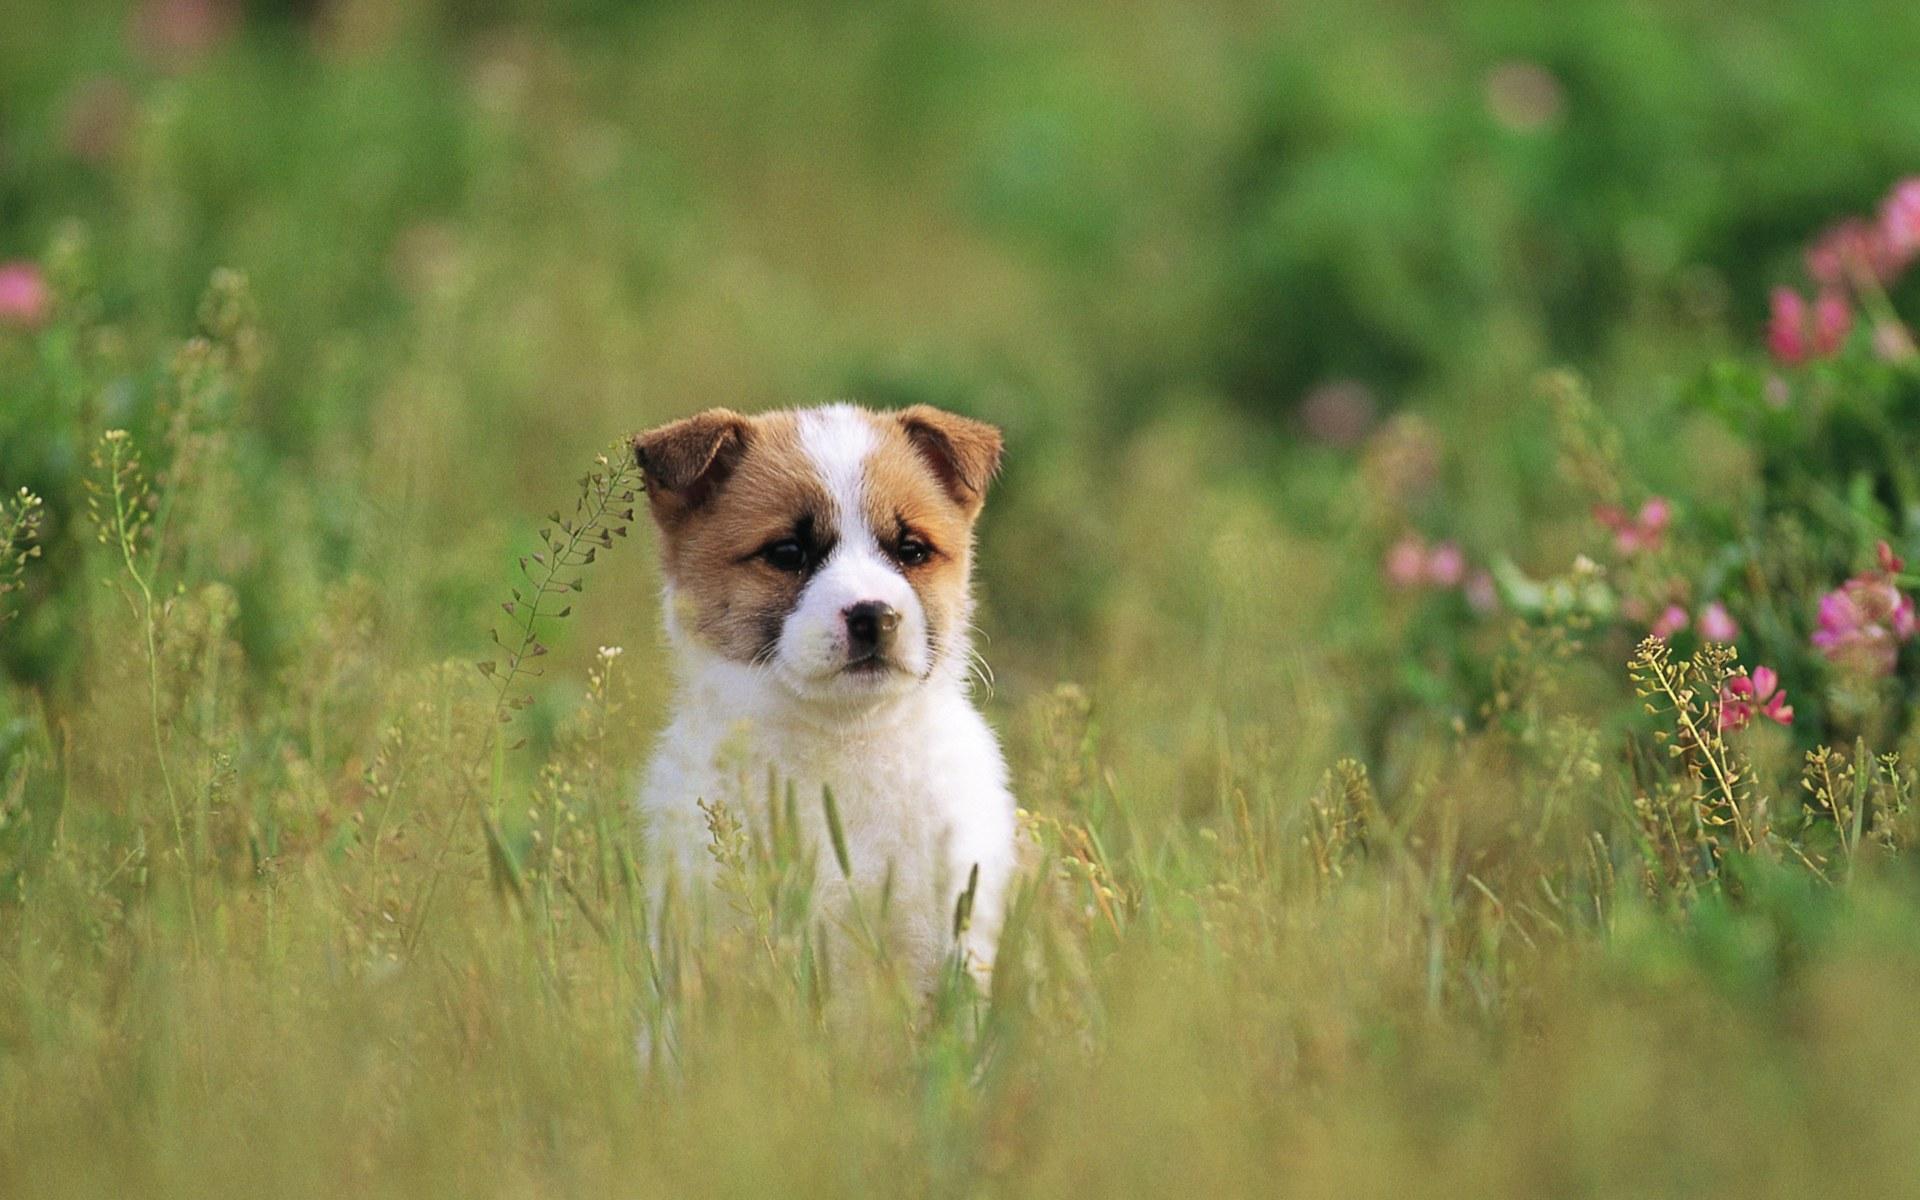 Pretty Dog wallpaper   Puppies Wallpaper 13906495 1920x1200